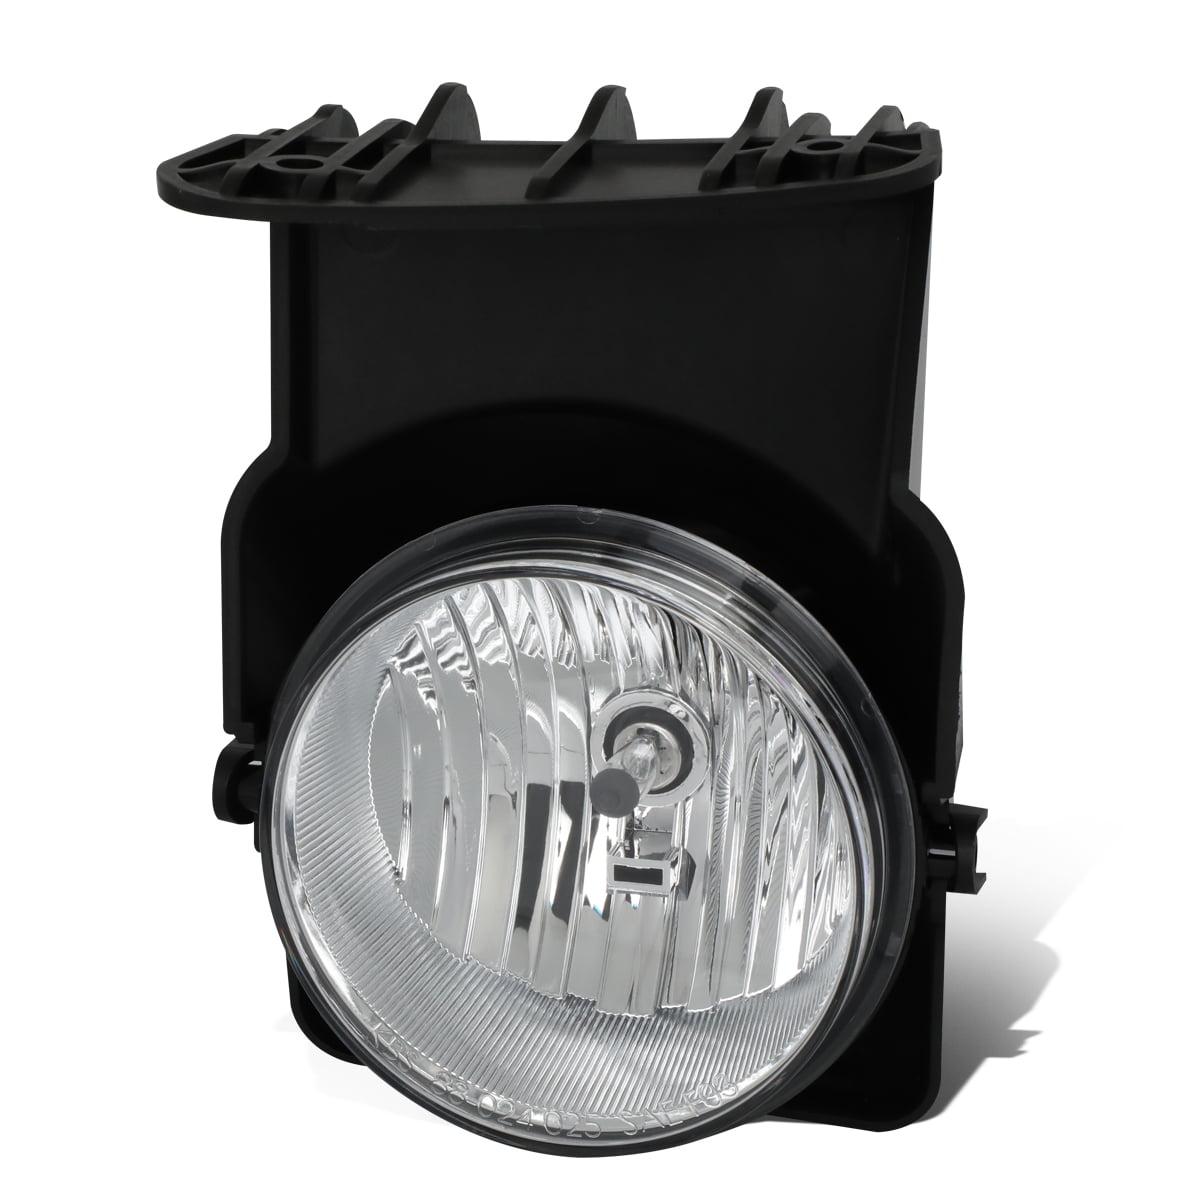 For 05-07 GMC Sierra Truck 1500 2500 3500 Classic Front Bumper Fog Light/Lamp Factory Style Left Side 06